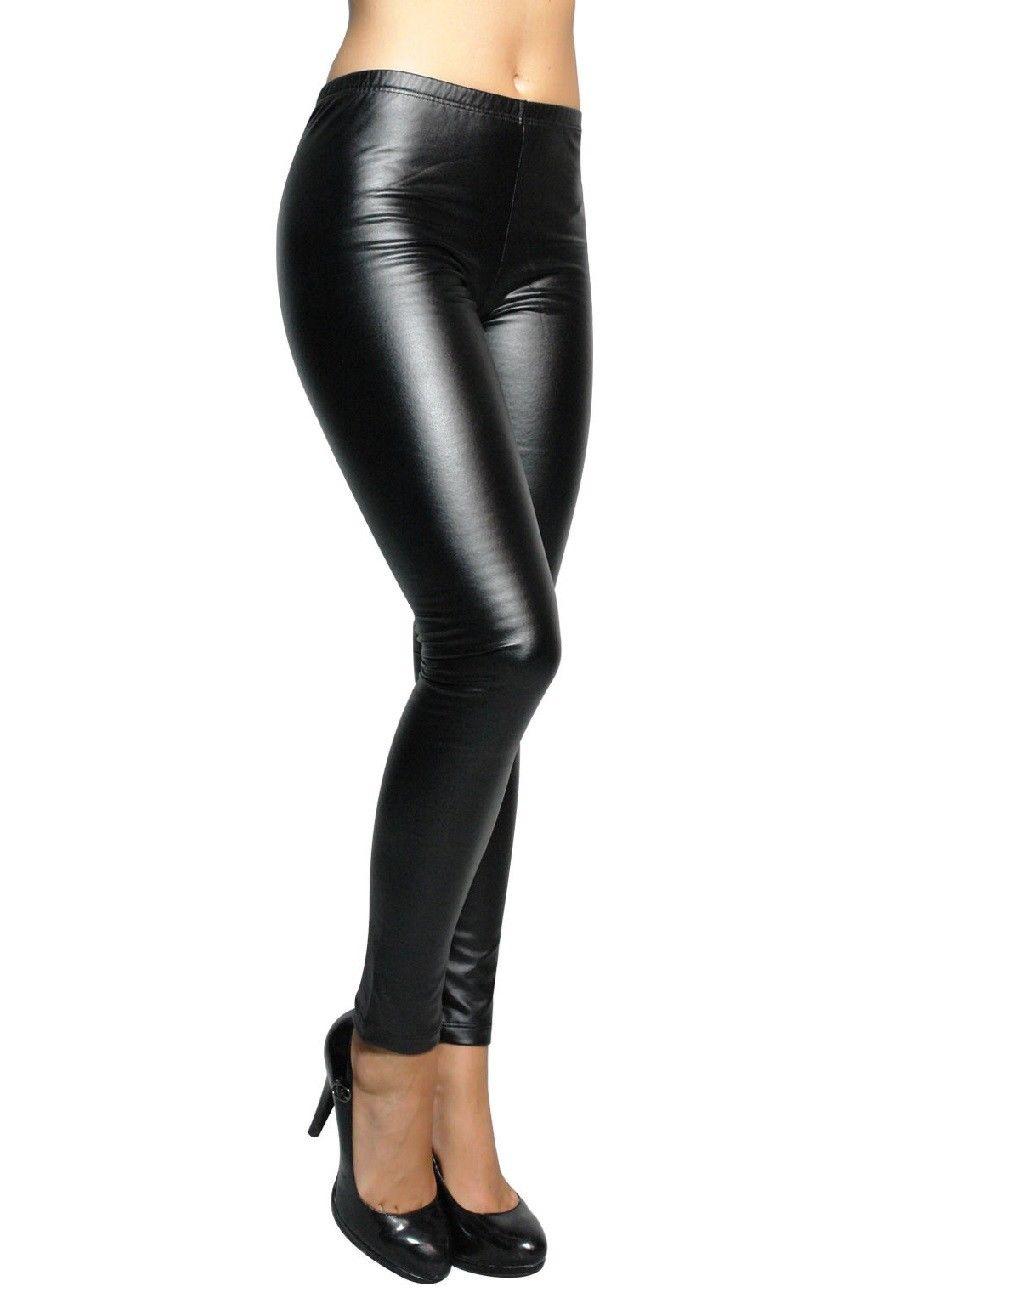 Leggings leggings effetto bagnato effetto Pelle Look Nero Termici Donne Uomini M-XL